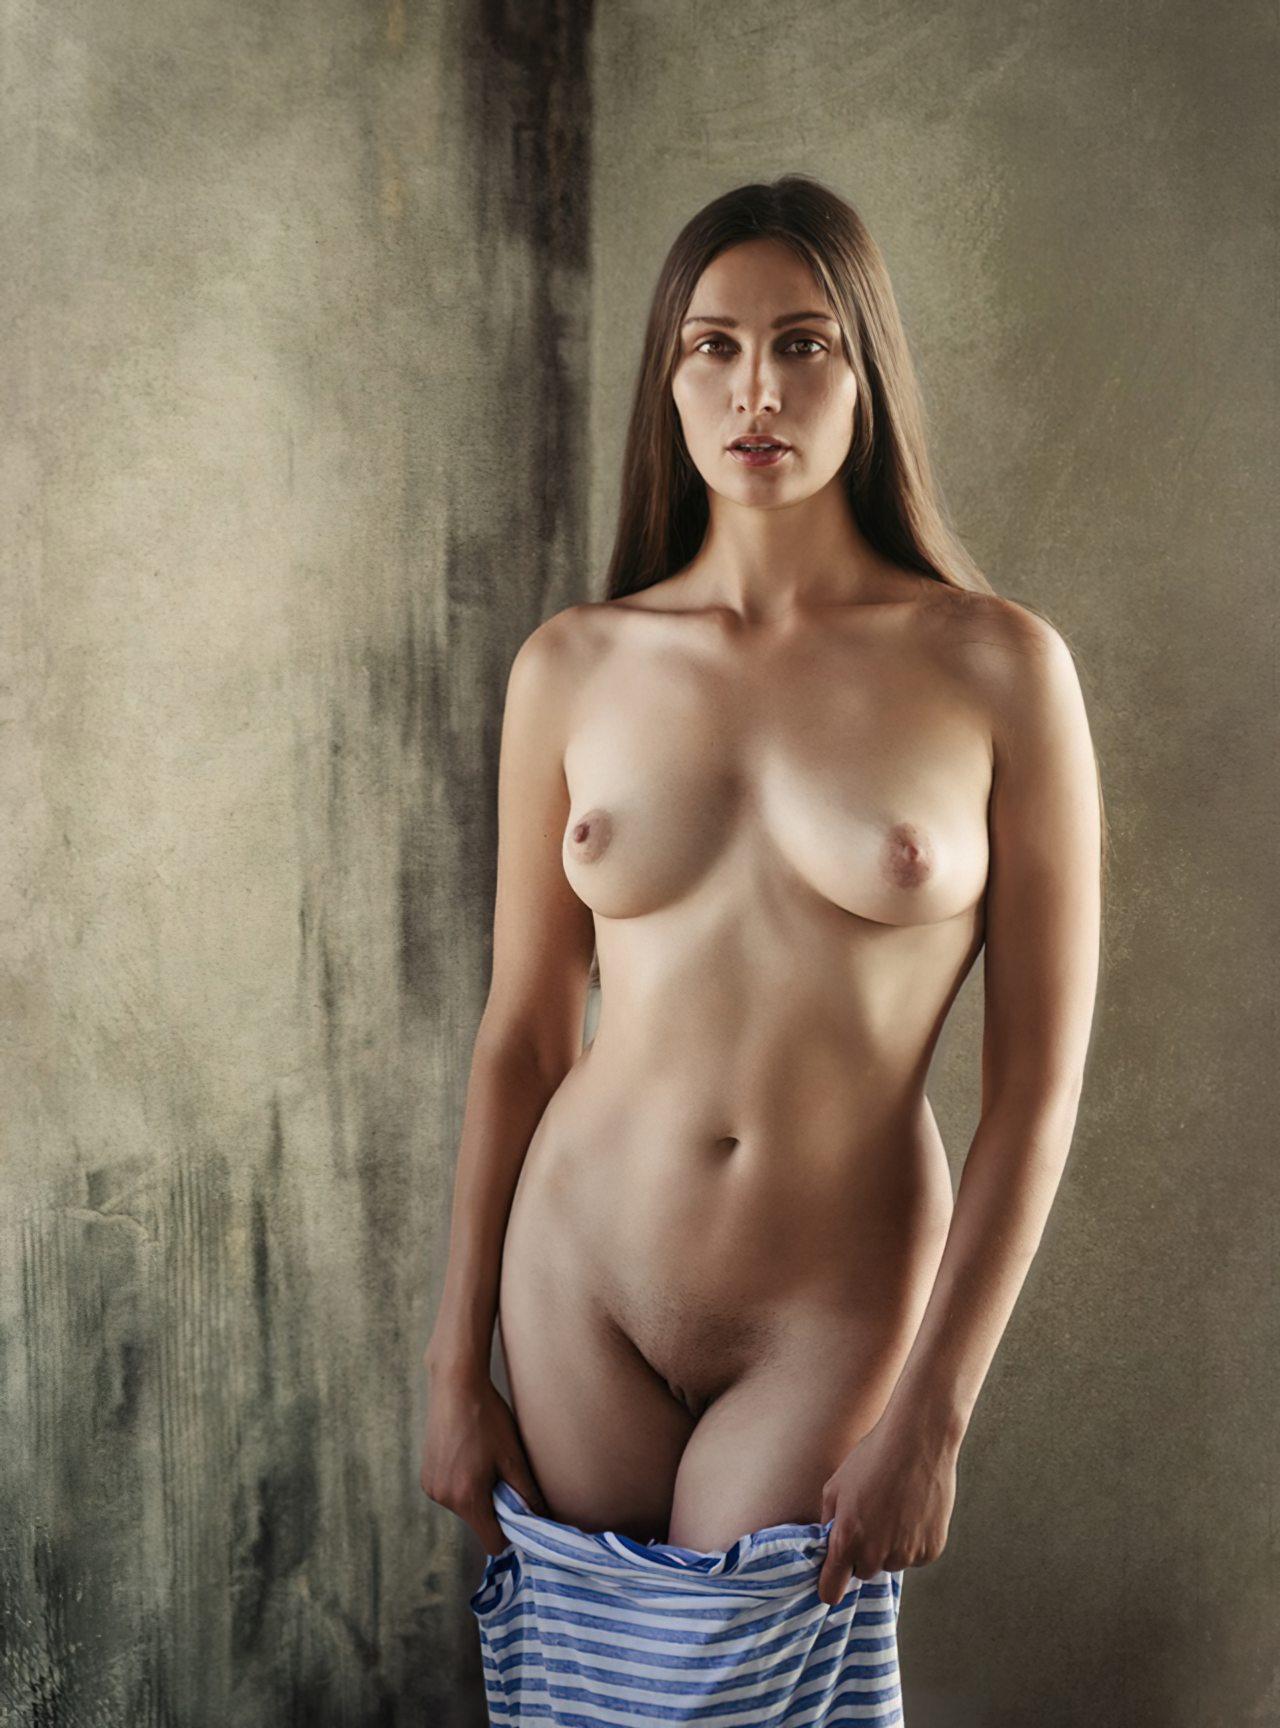 Fotos de Mulheres Nuas (11)